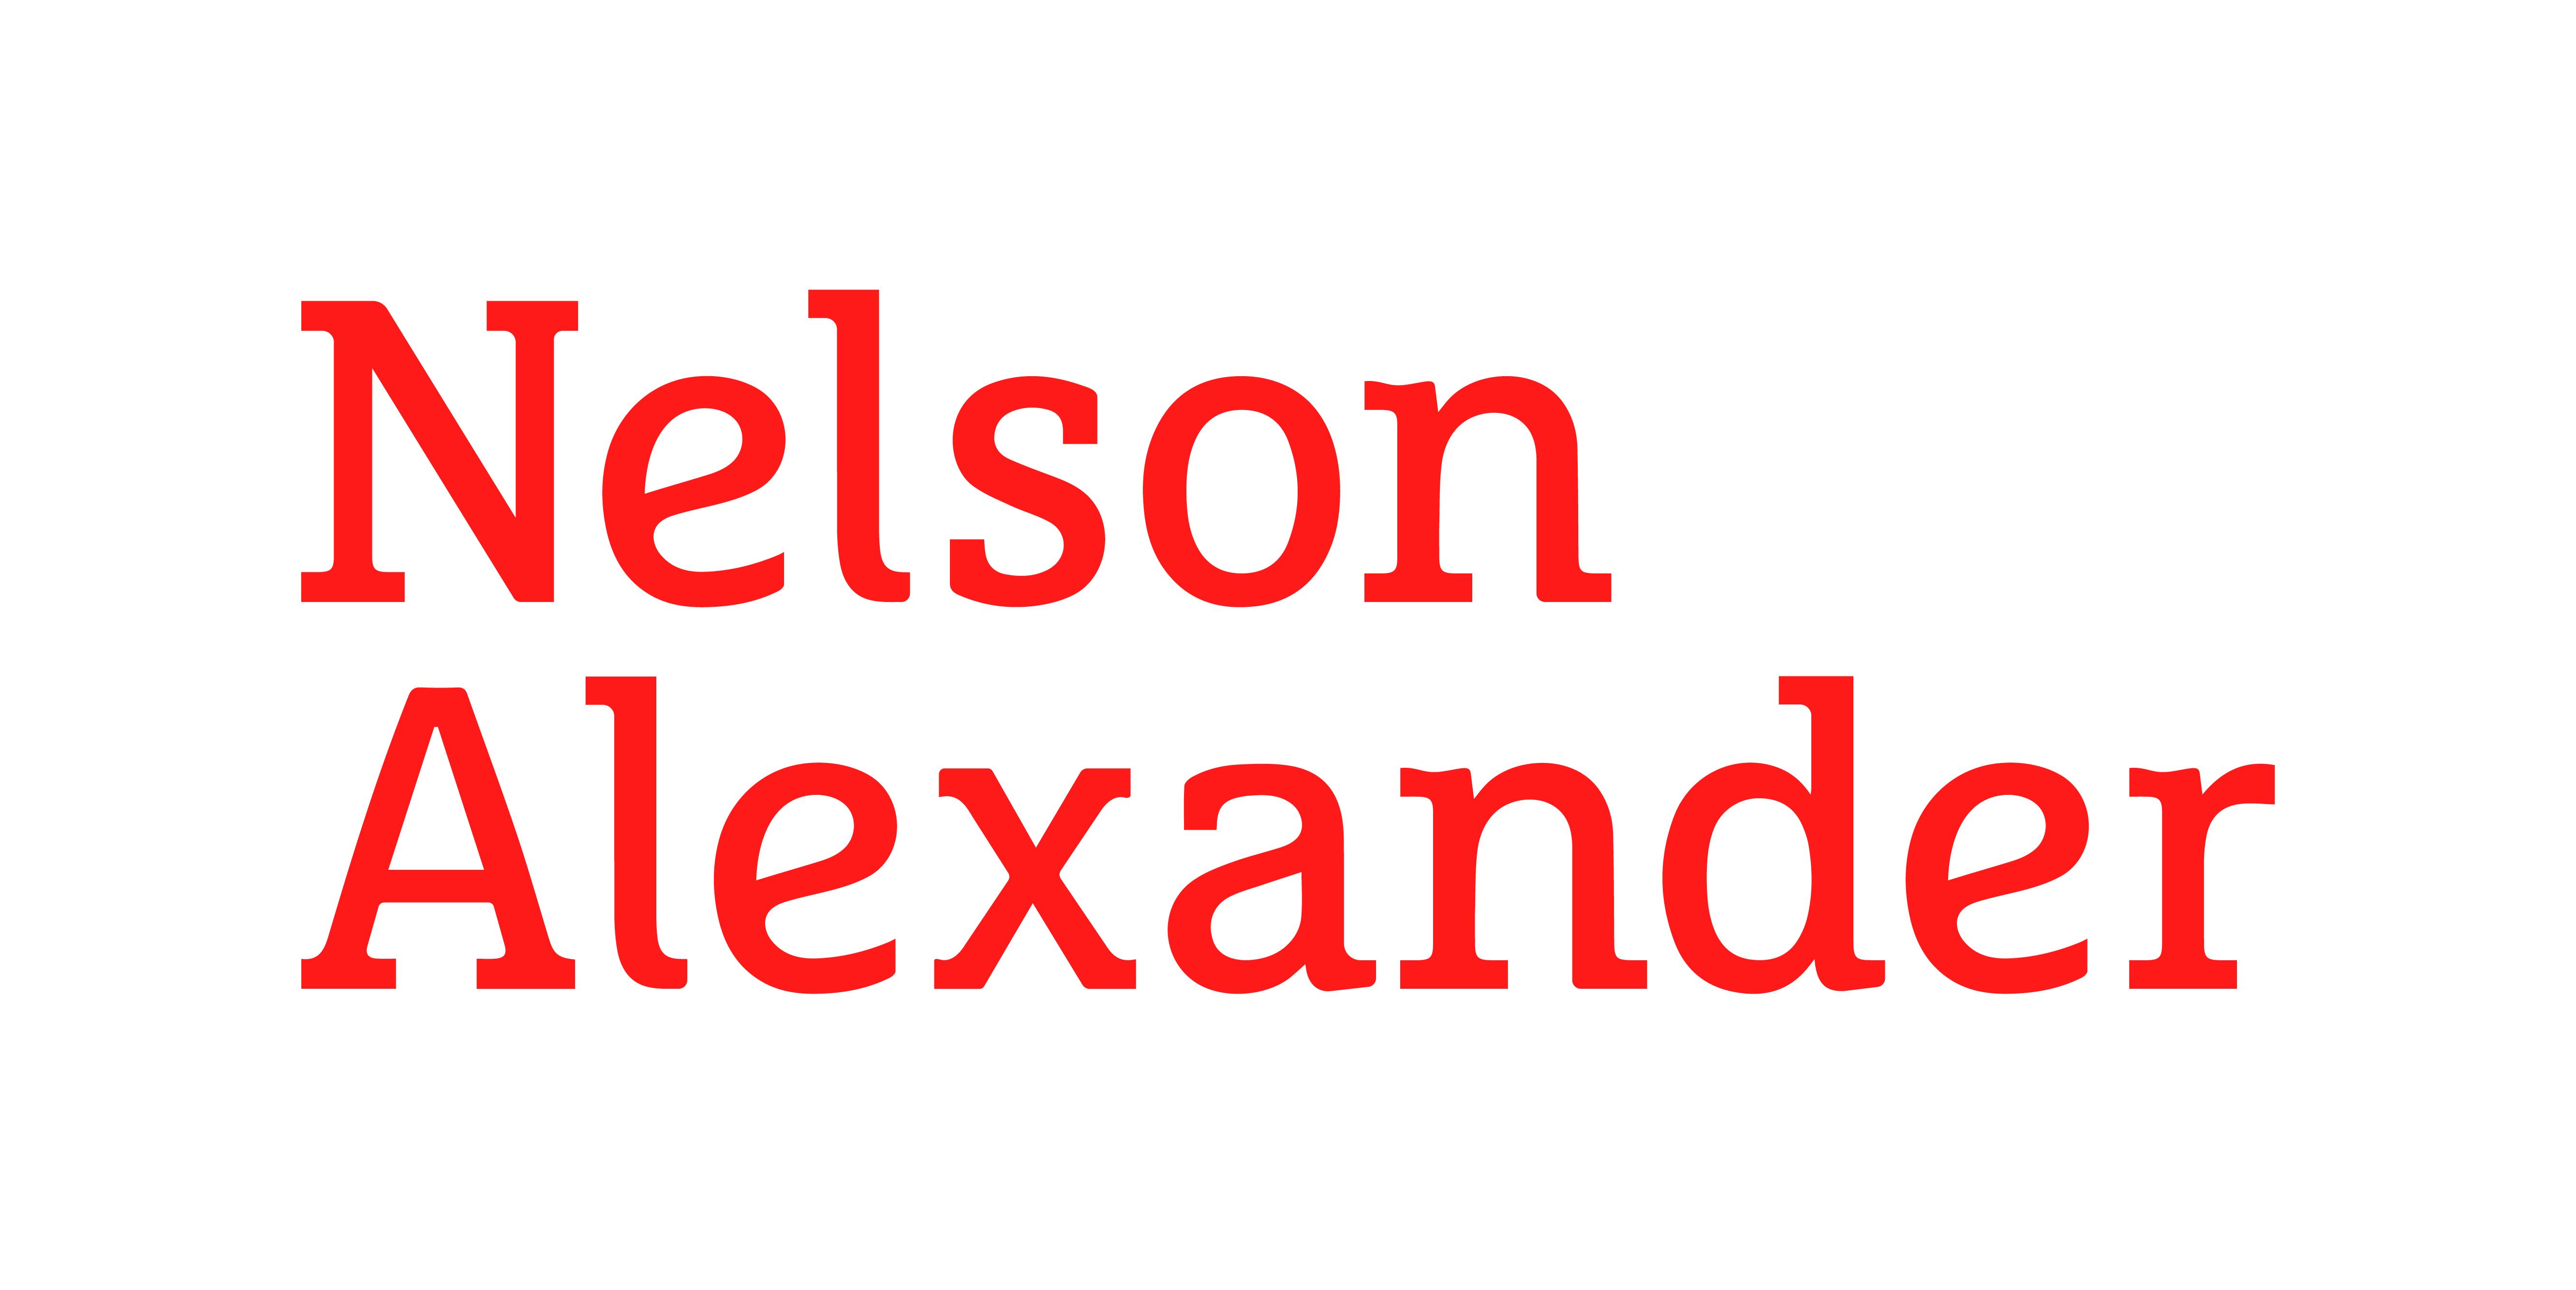 NelsonAlexander Brandmark CMYK Primary Positive (1)